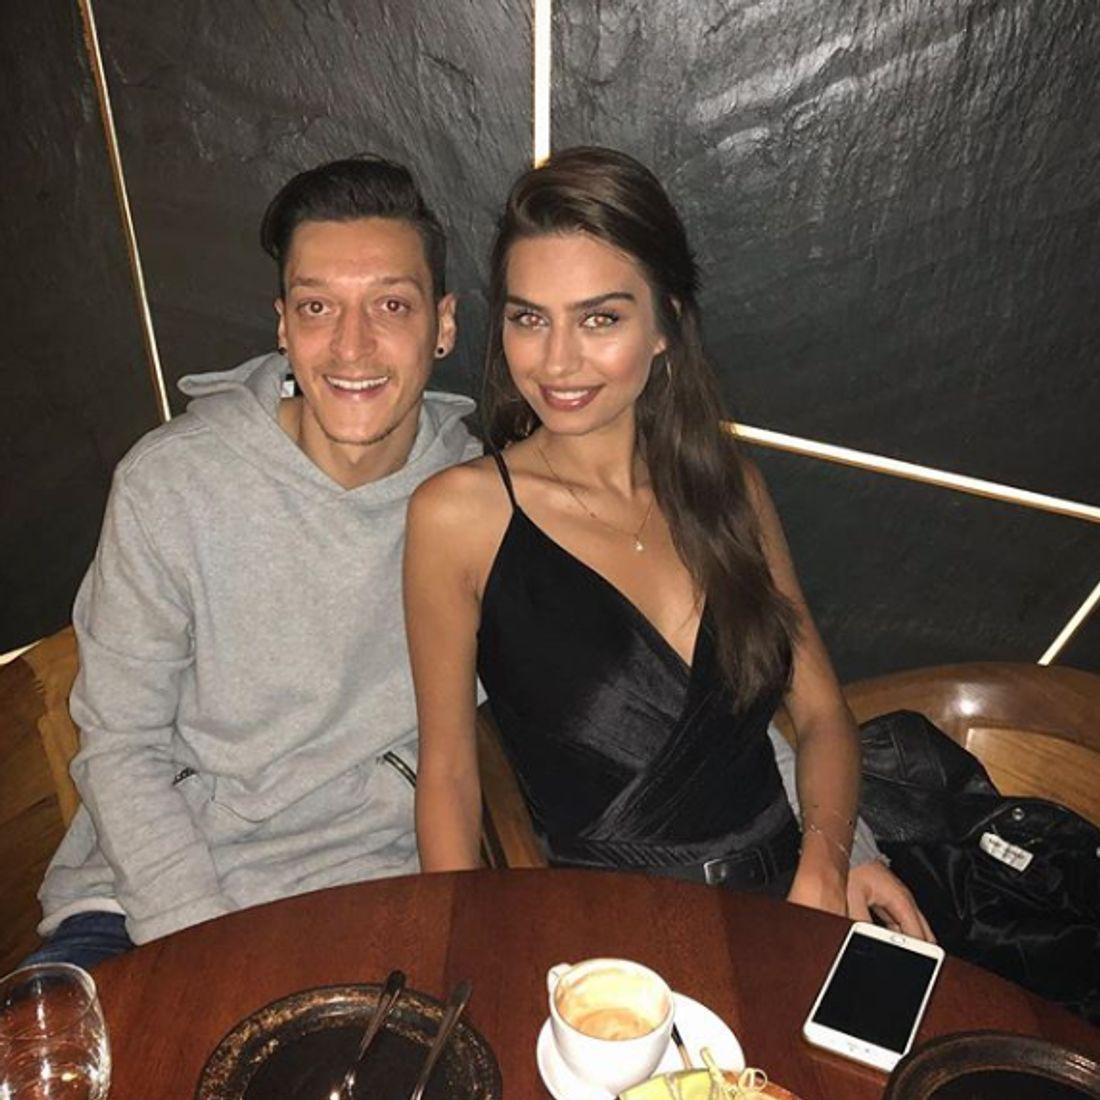 Bringt Mesut Özil seine Freundin Amine Gülse in Gefahr?